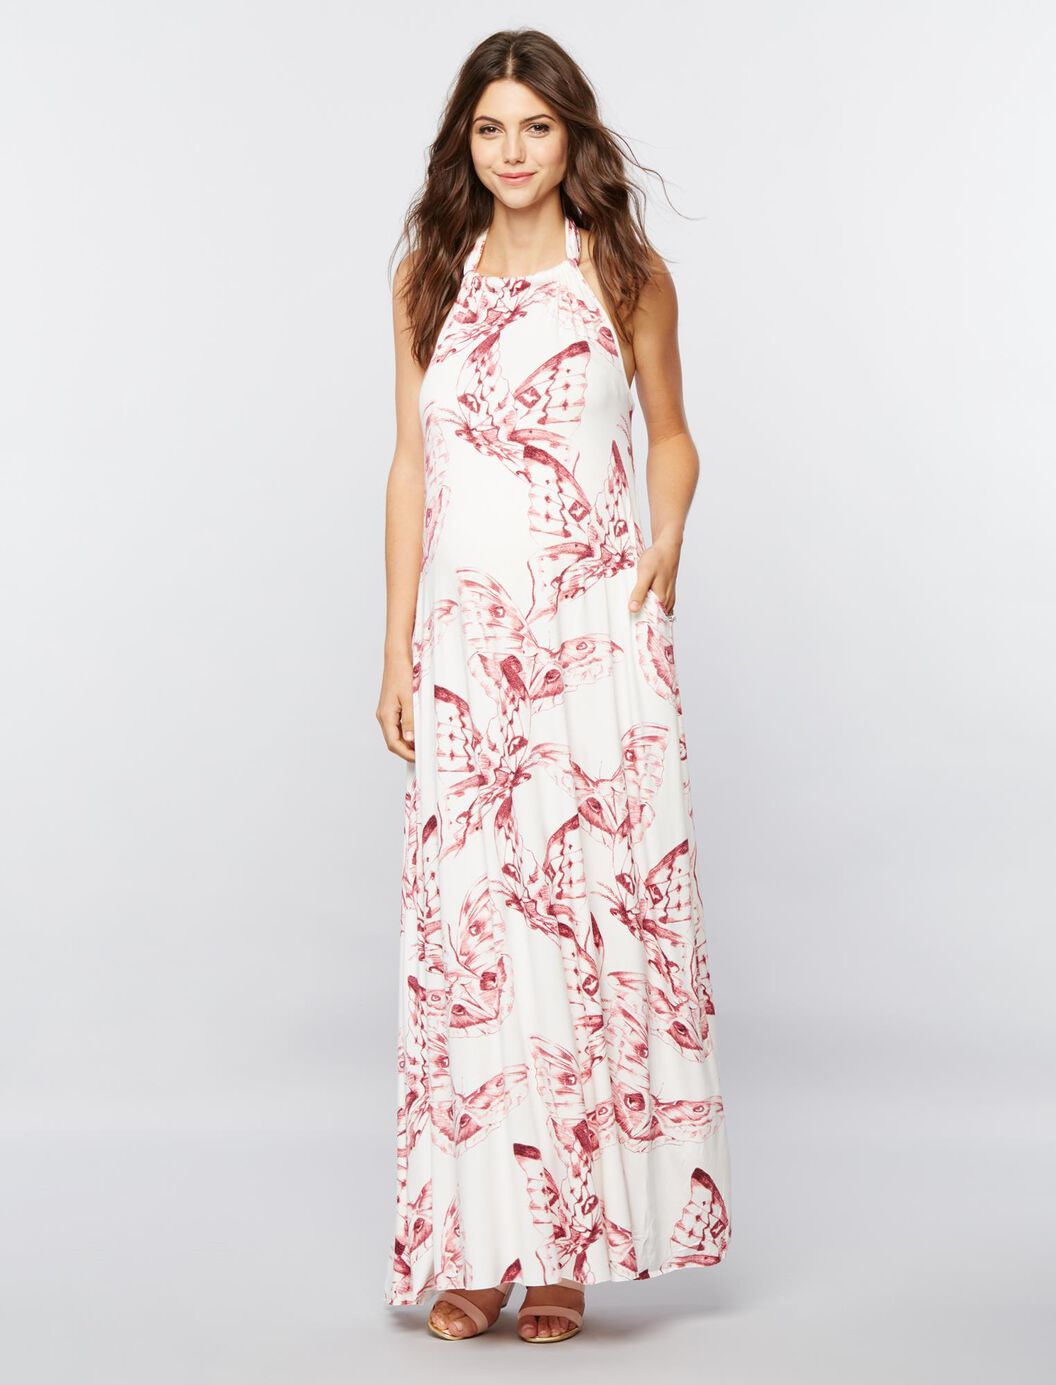 Rachel pally halter maxi maternity dress a pea in the pod maternity rachel pally halter maxi maternity dress print ombrellifo Images